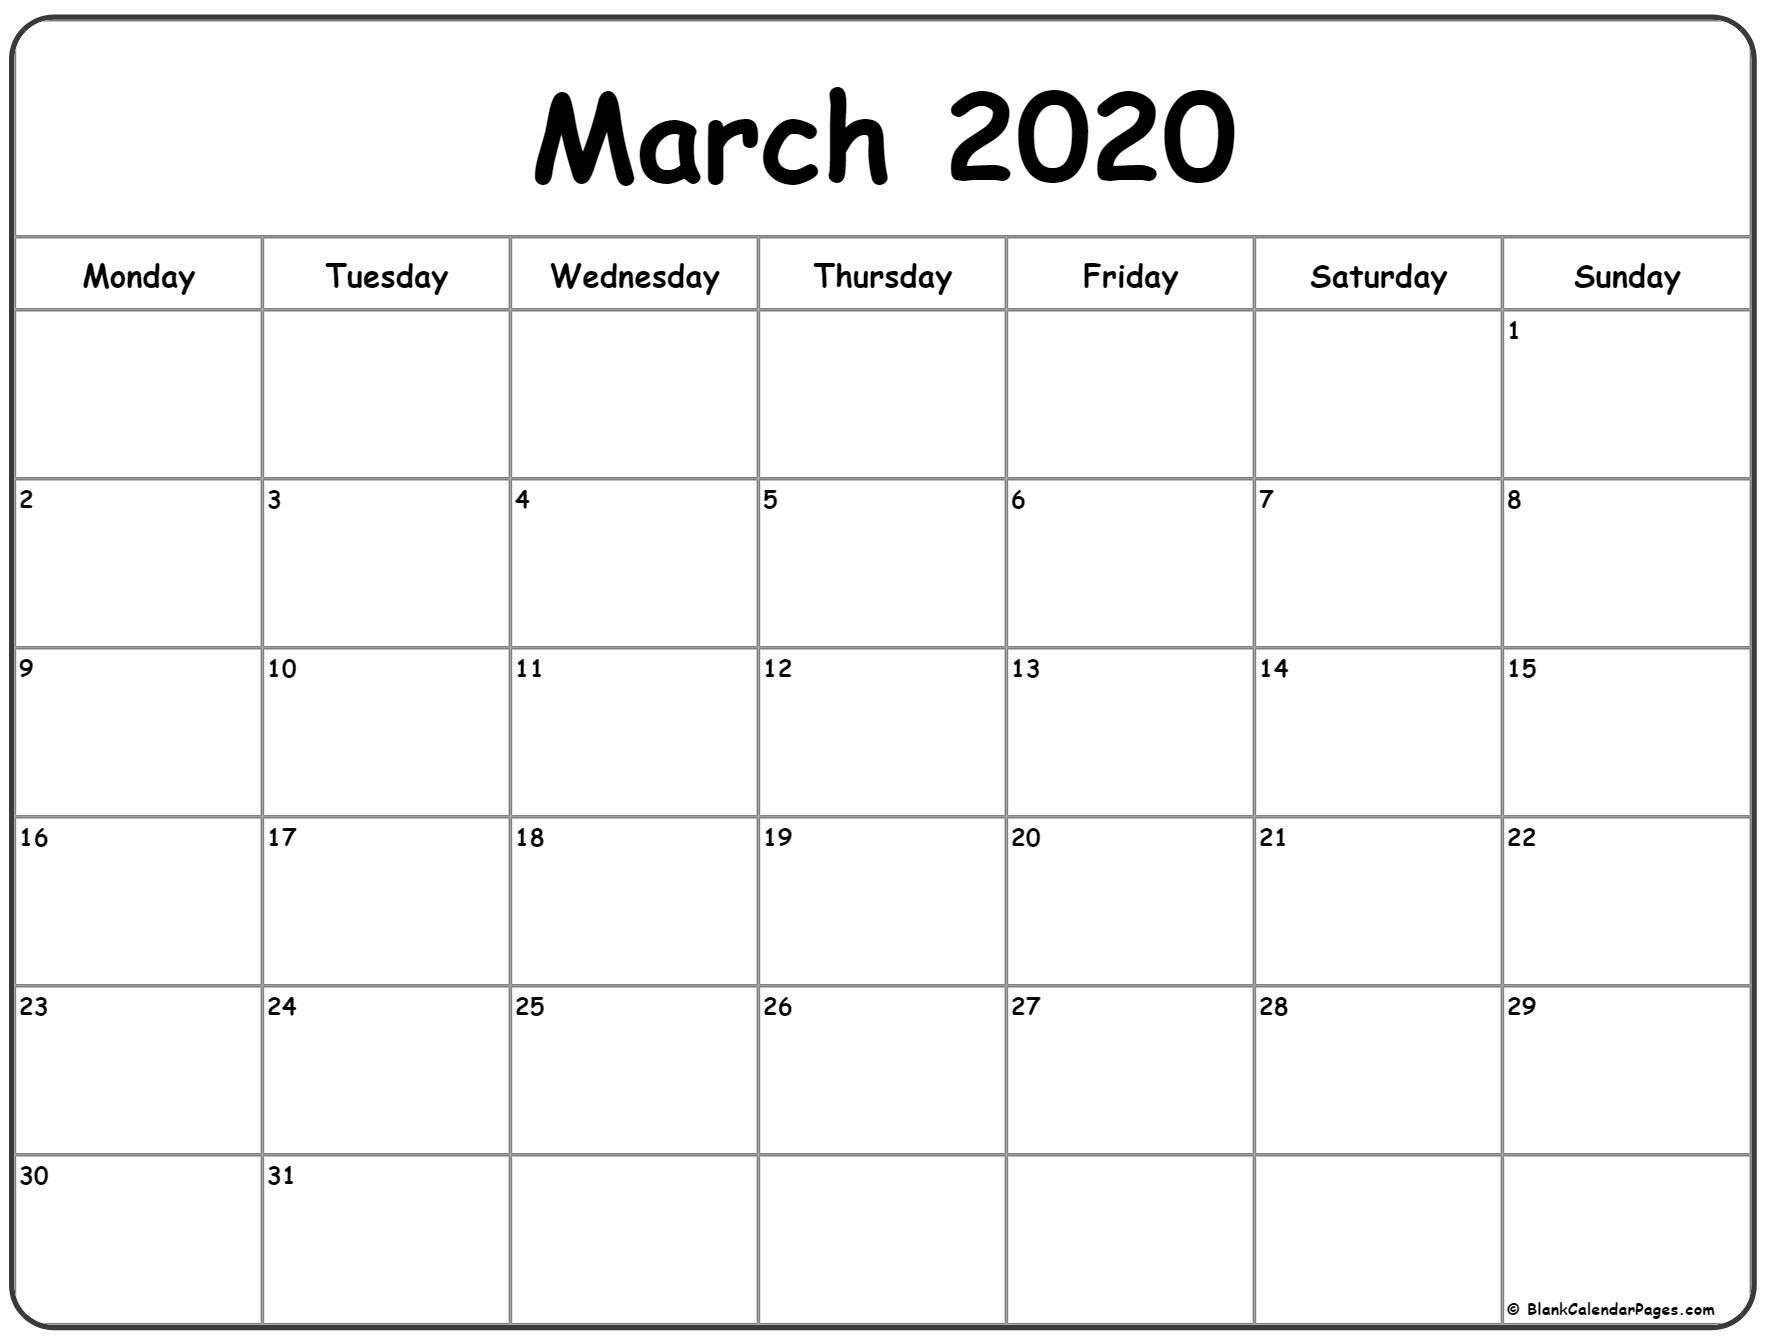 March 2020 Monday Calendar | Monday To Sunday throughout Monday - Sunday 2020